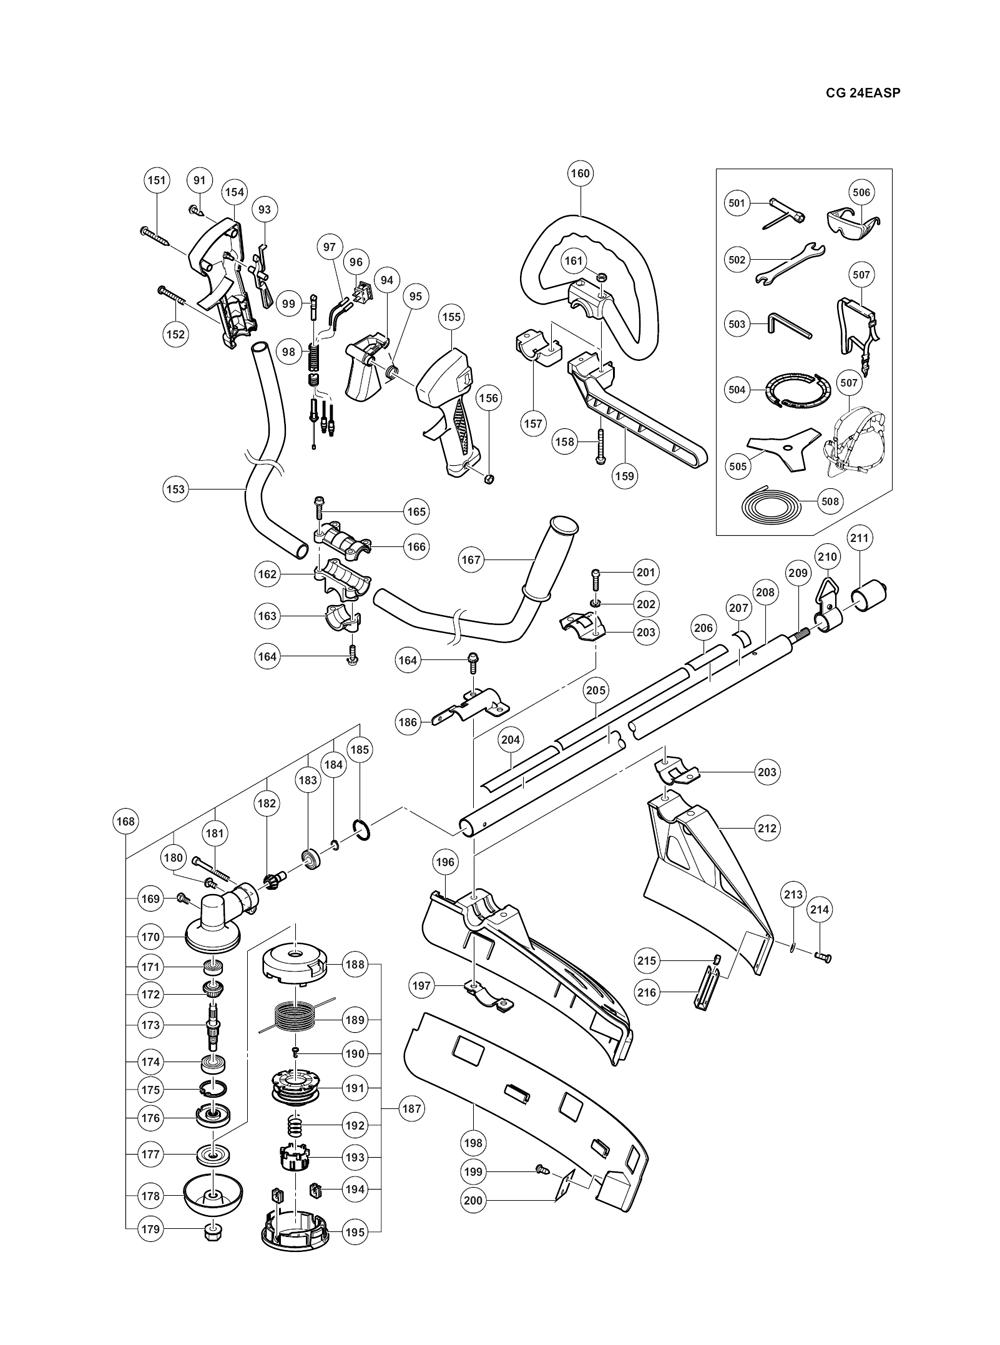 CG24EASP-Hitachi-PB-2Break Down